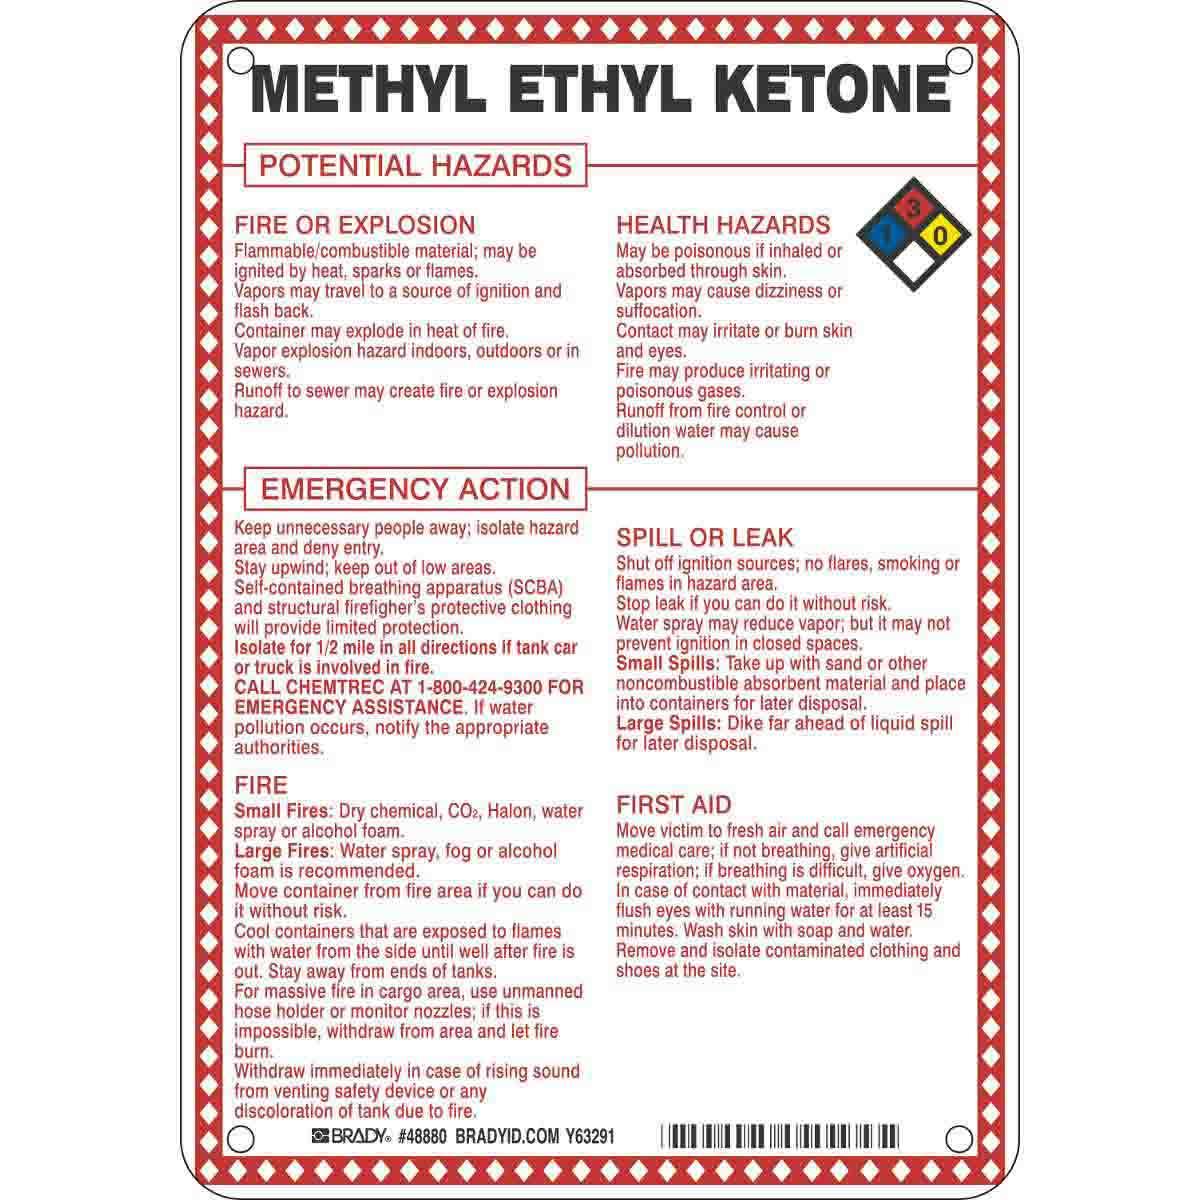 Methyl Ethyl Ketone Potential Hazards Sign